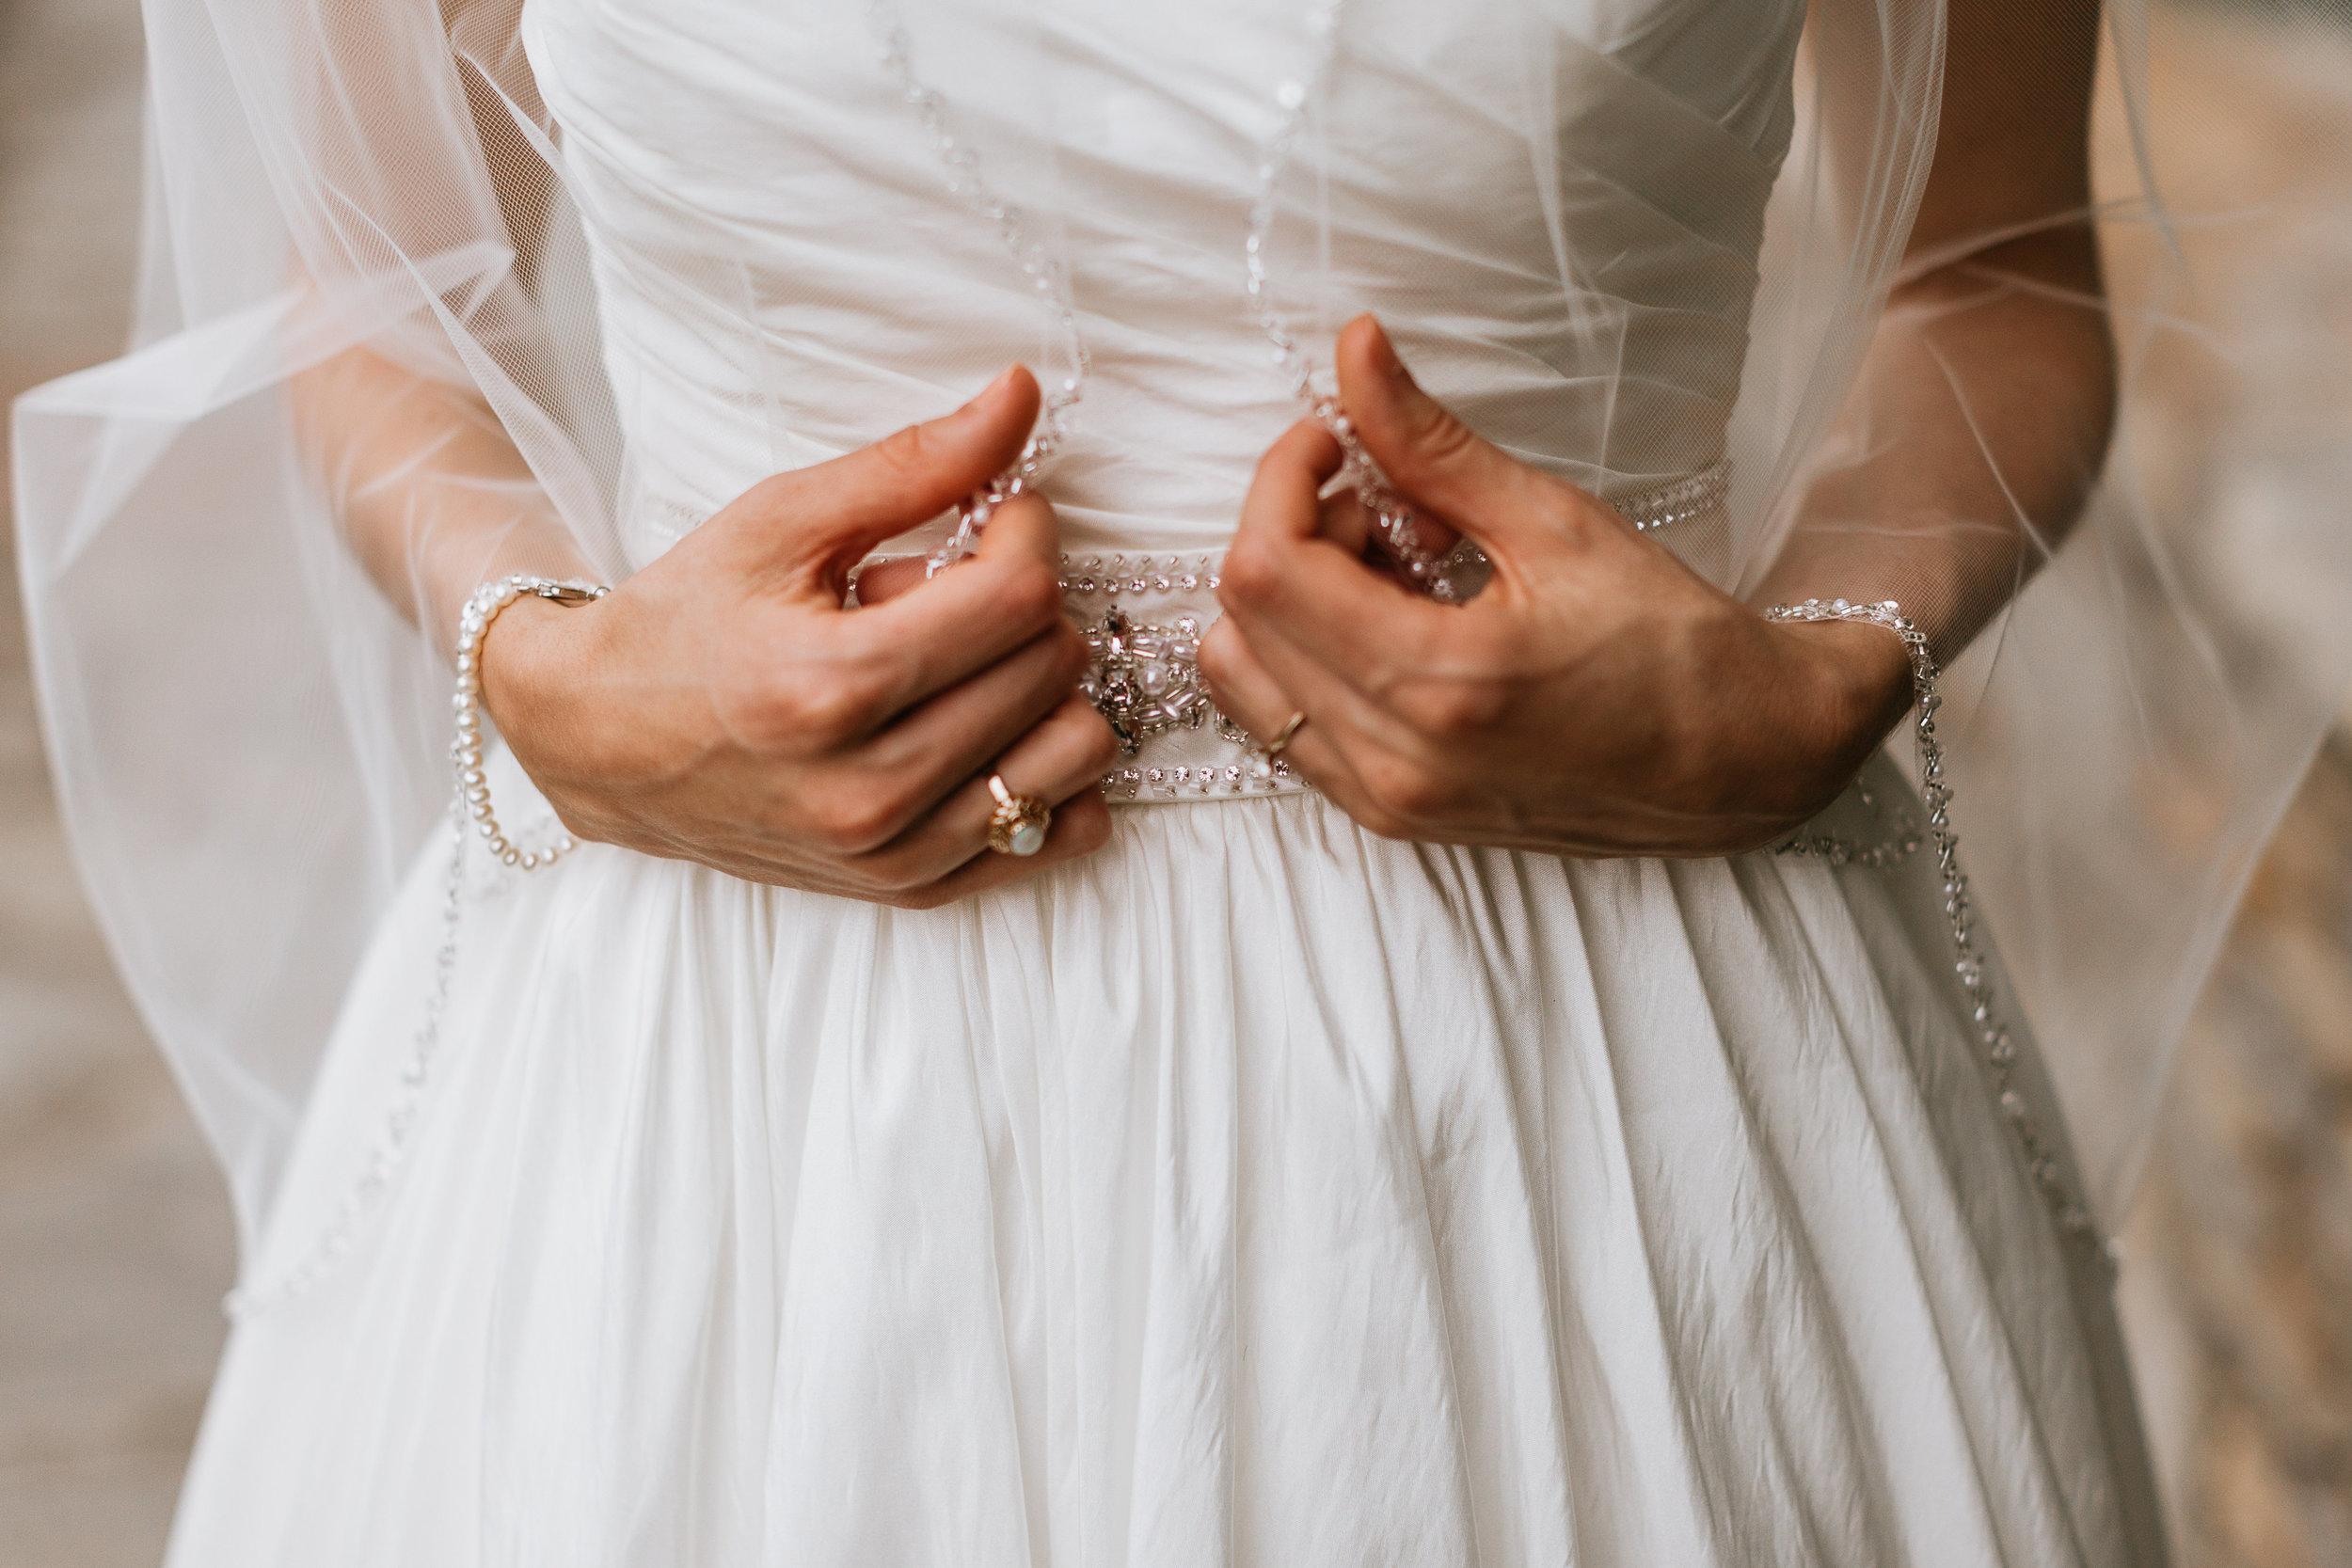 hanna bridals pt 3-hanna bridals-0013.jpg